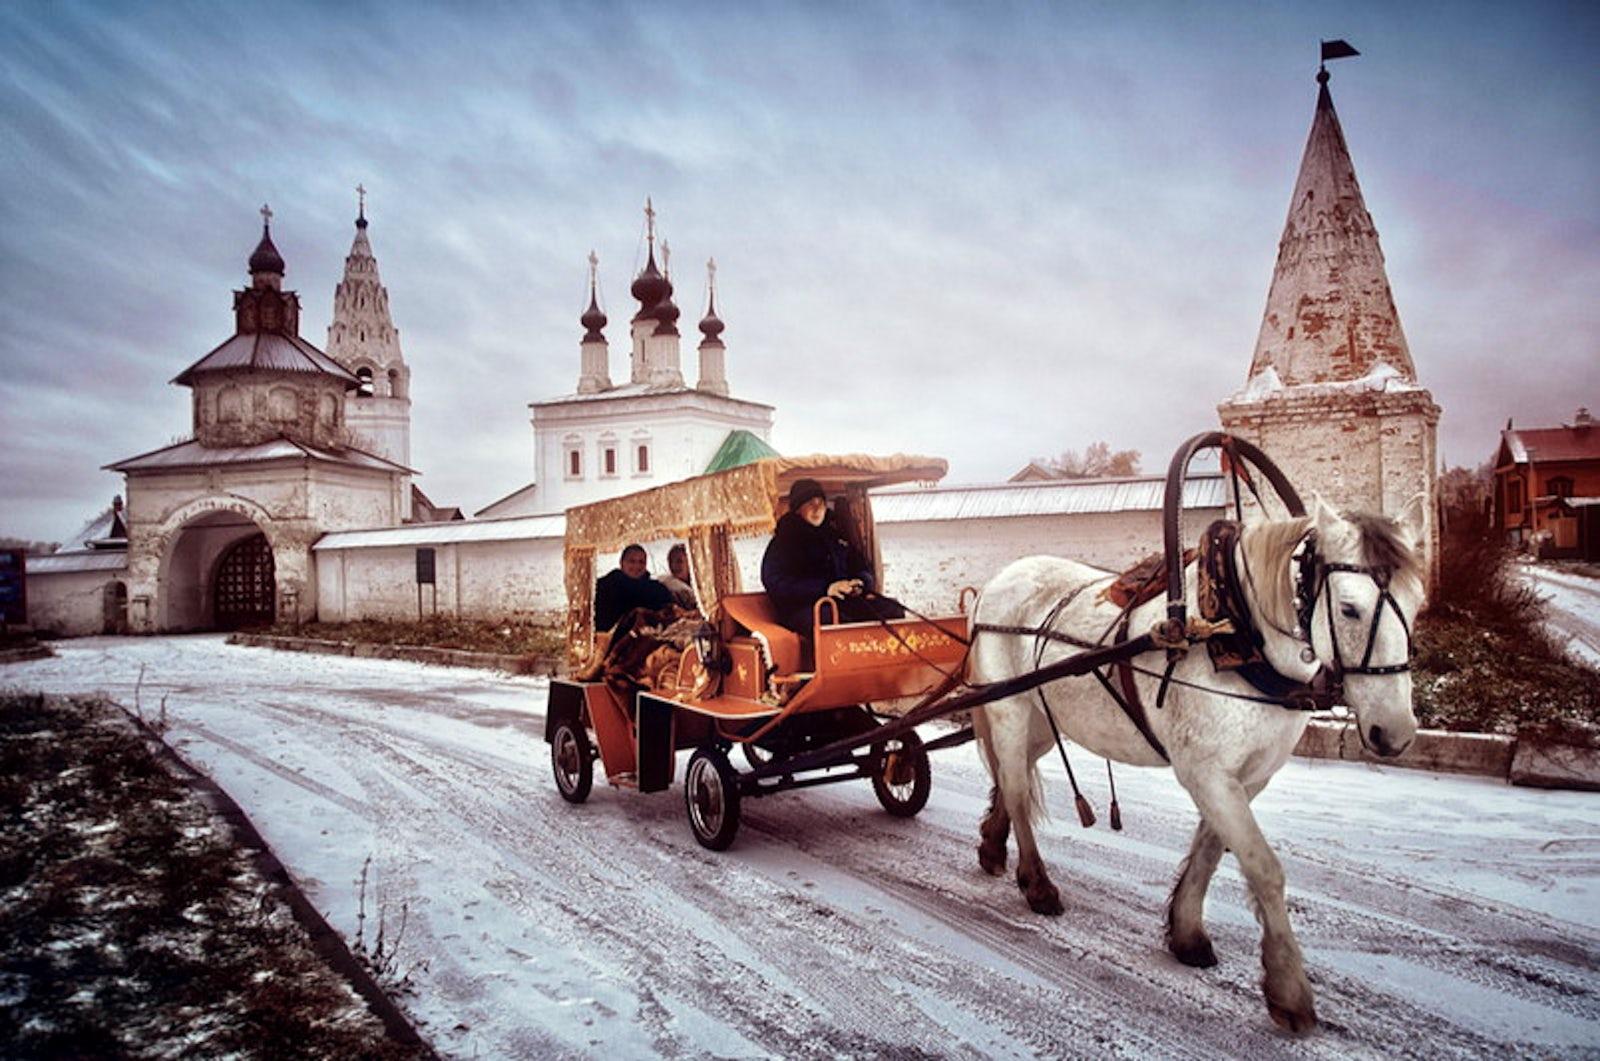 Cover photo © credits to dmitry_feofanov